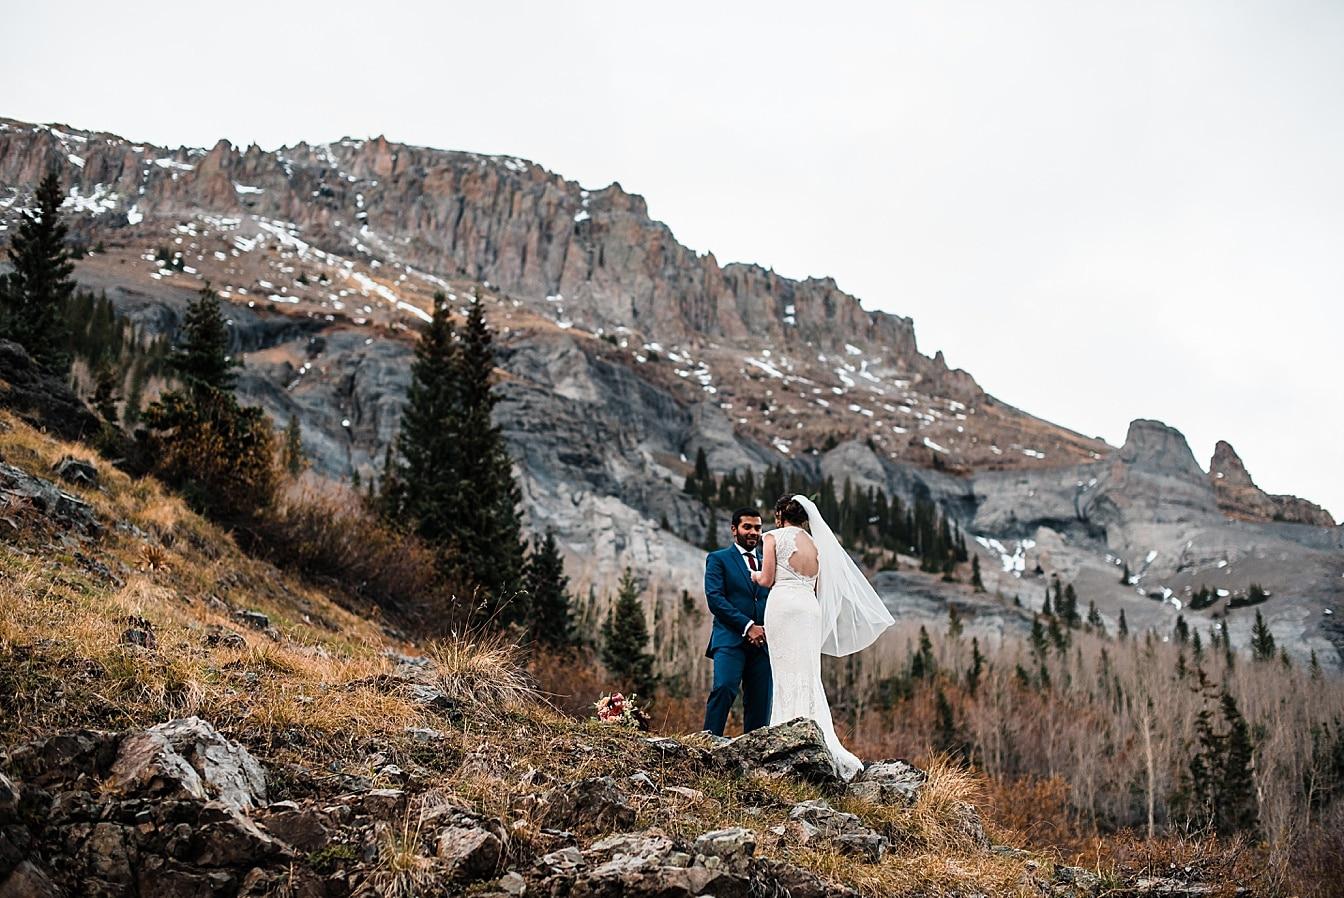 Colorado-Mountain-Elopement-Meredith-Humayun_0011.jpg